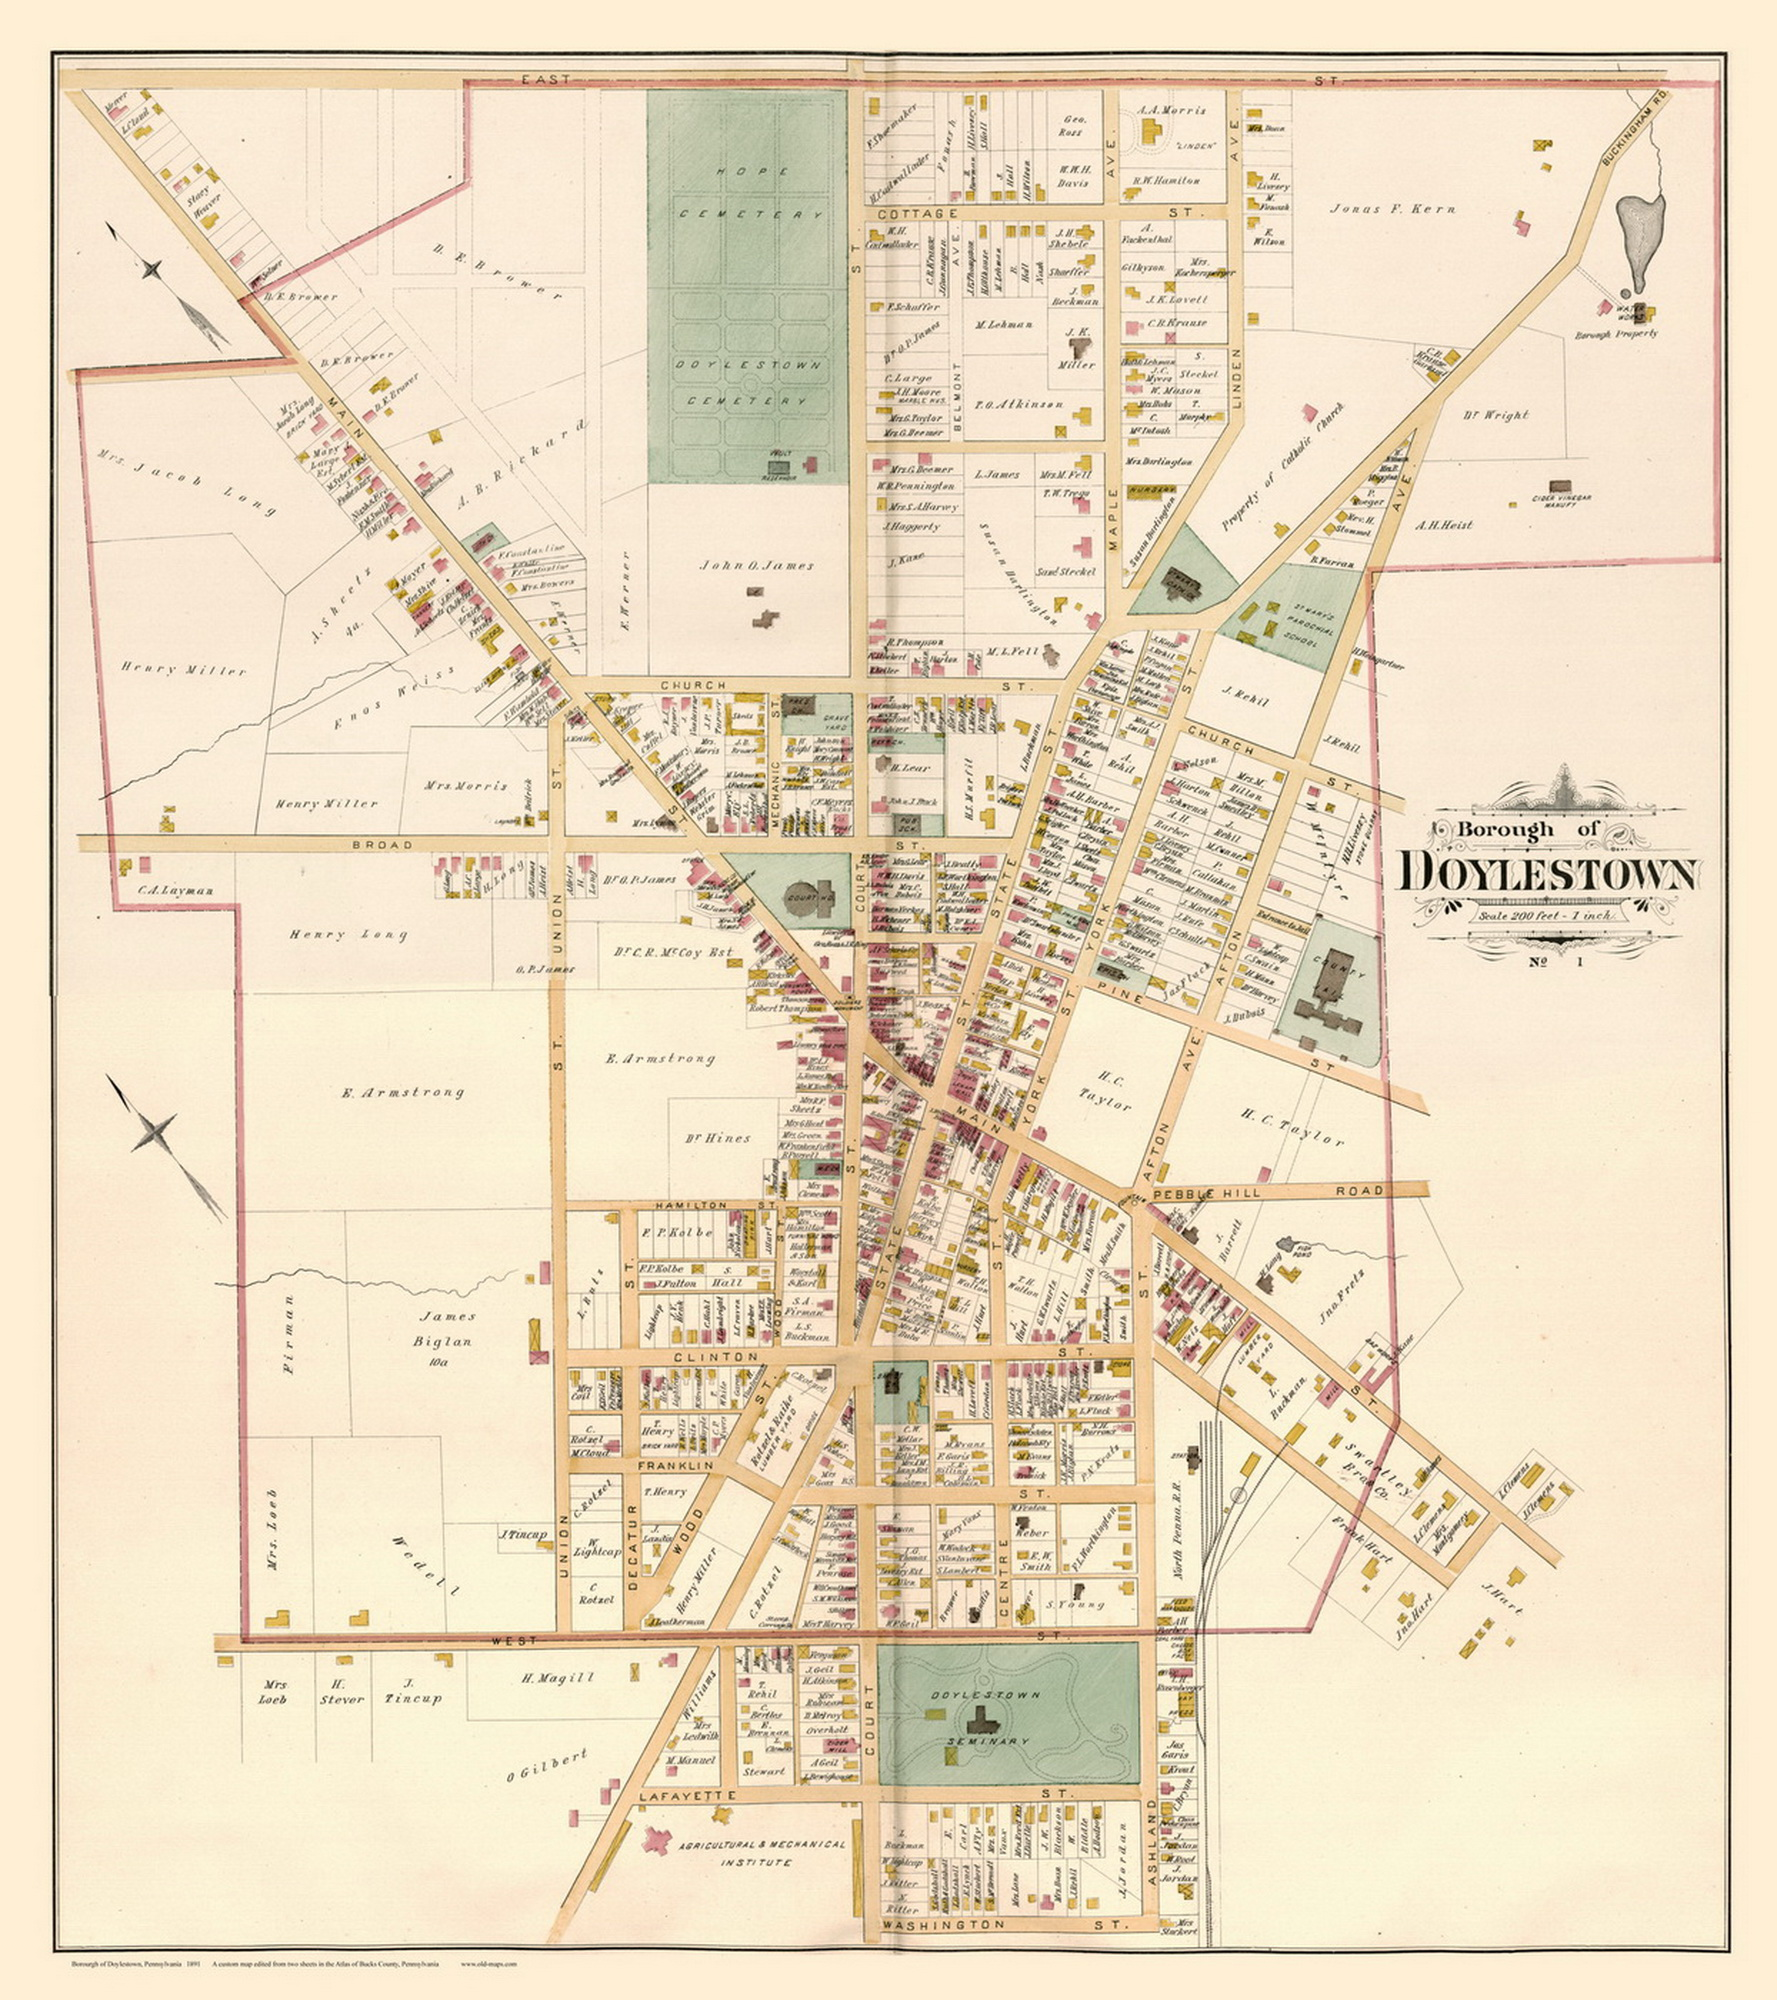 Image of: Borough Of Doylestown Pennsylvania 1891 Old Map Reprint Bucks County Old Maps